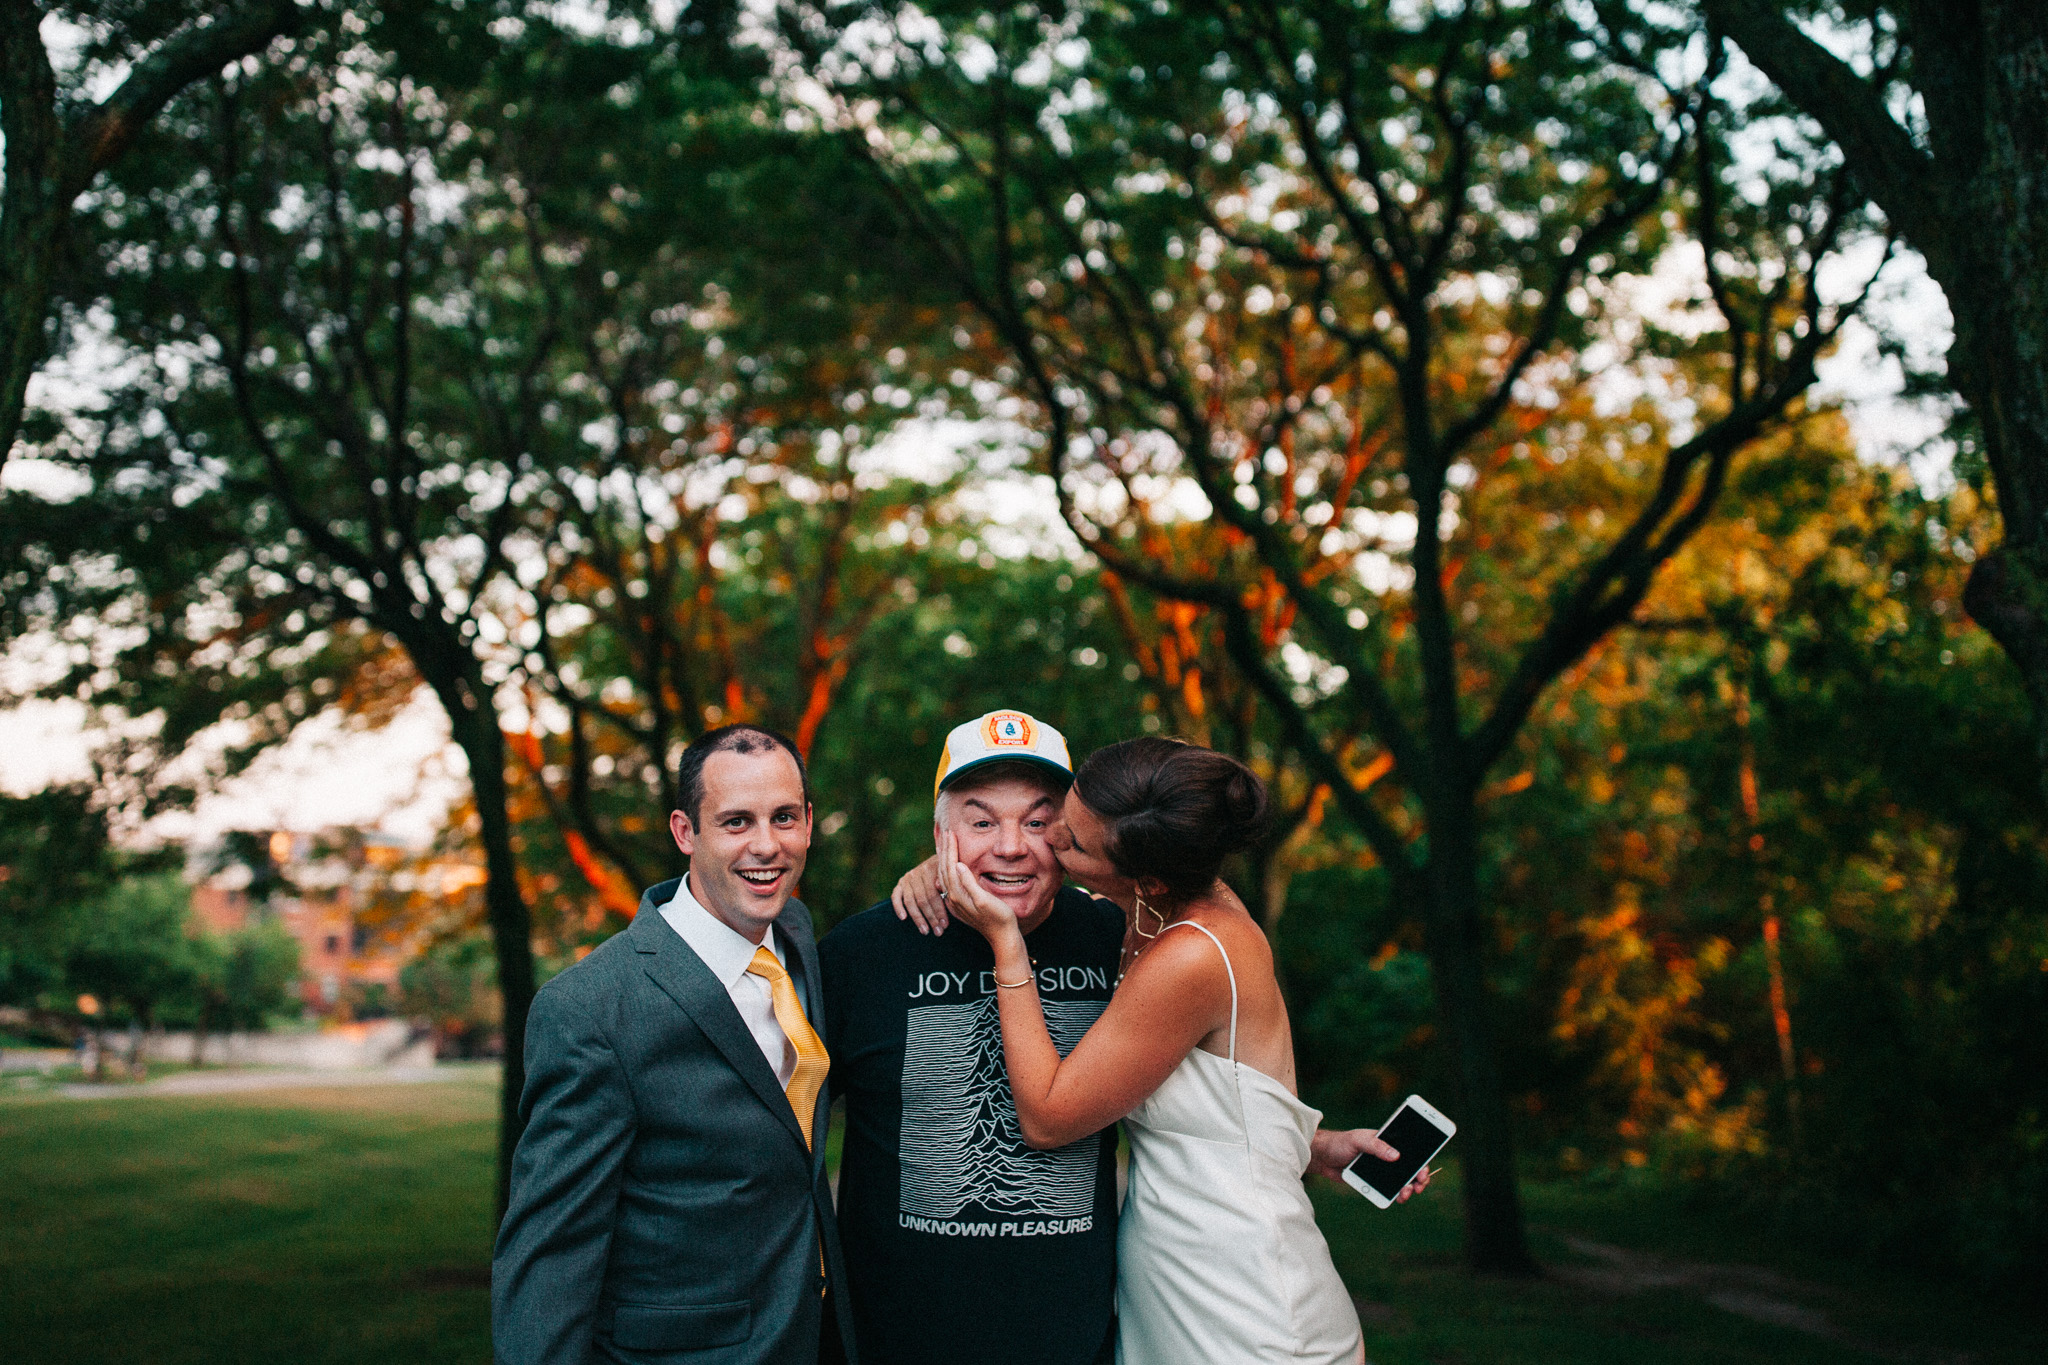 Mike Myers Wedding Photobomb